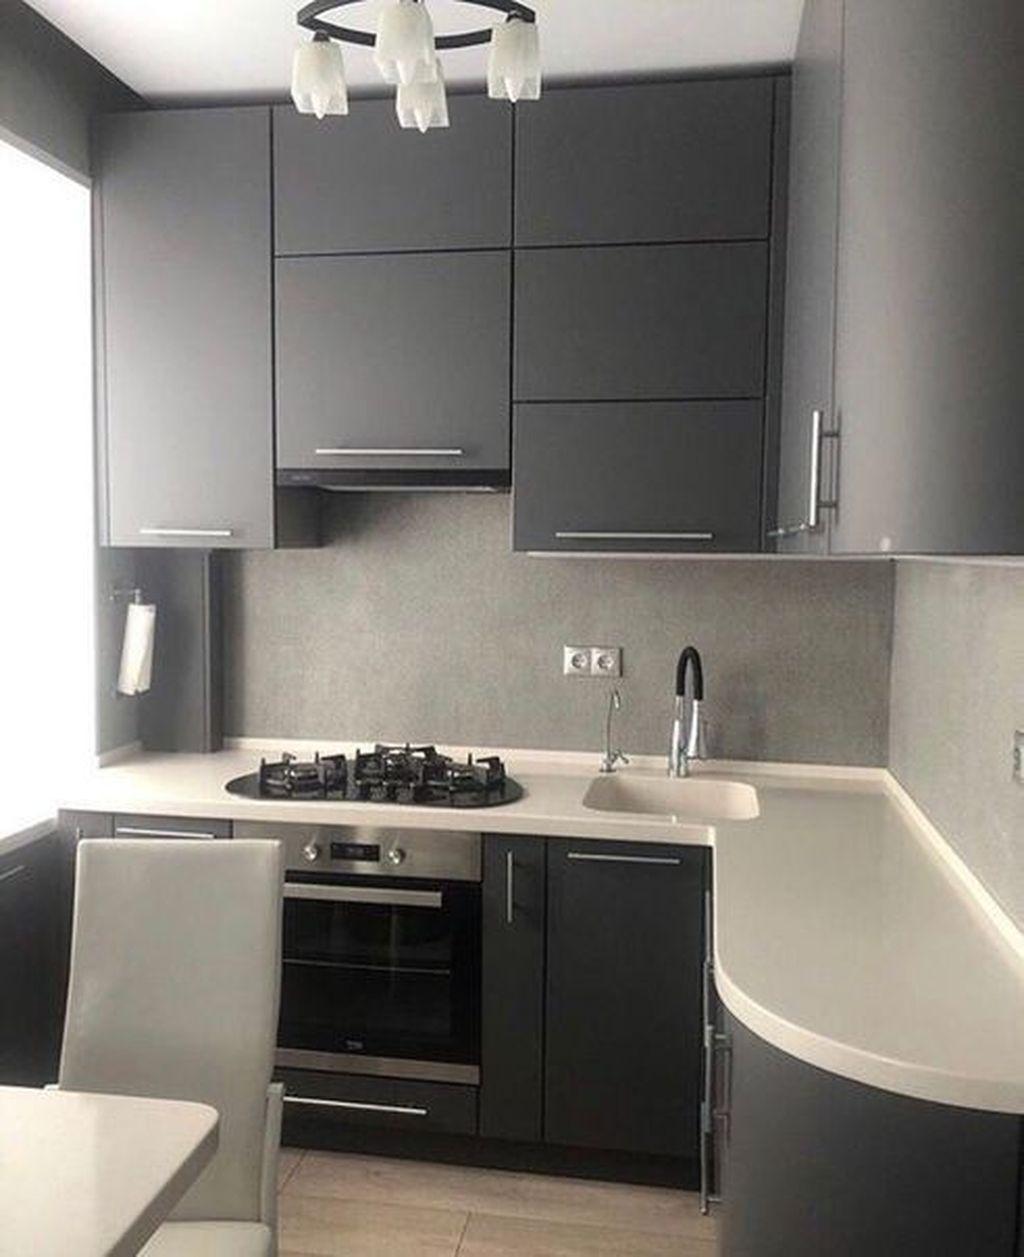 Popular Apartment Kitchen Design Ideas You Should Copy 16